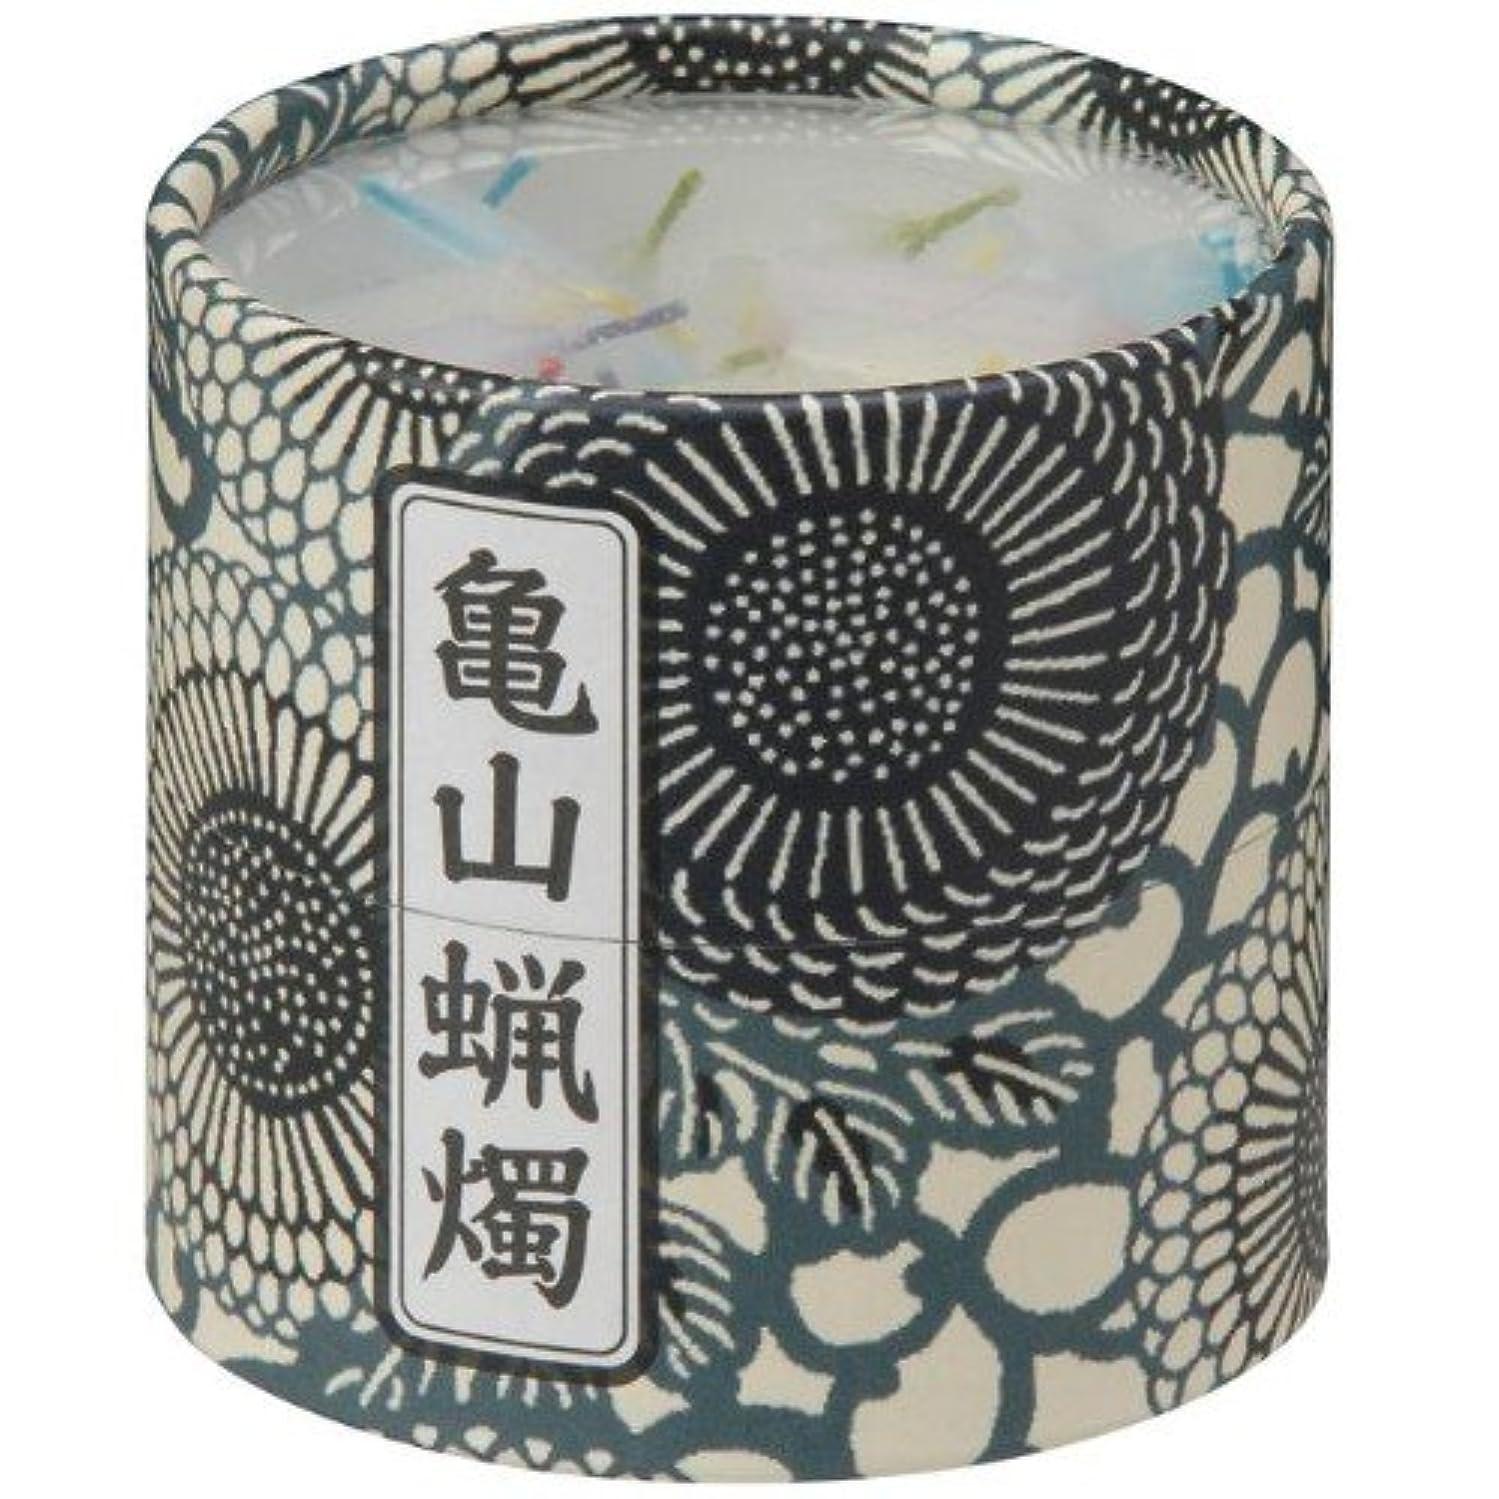 優雅な豆輸血亀山五色蝋燭(小) 約130本入り